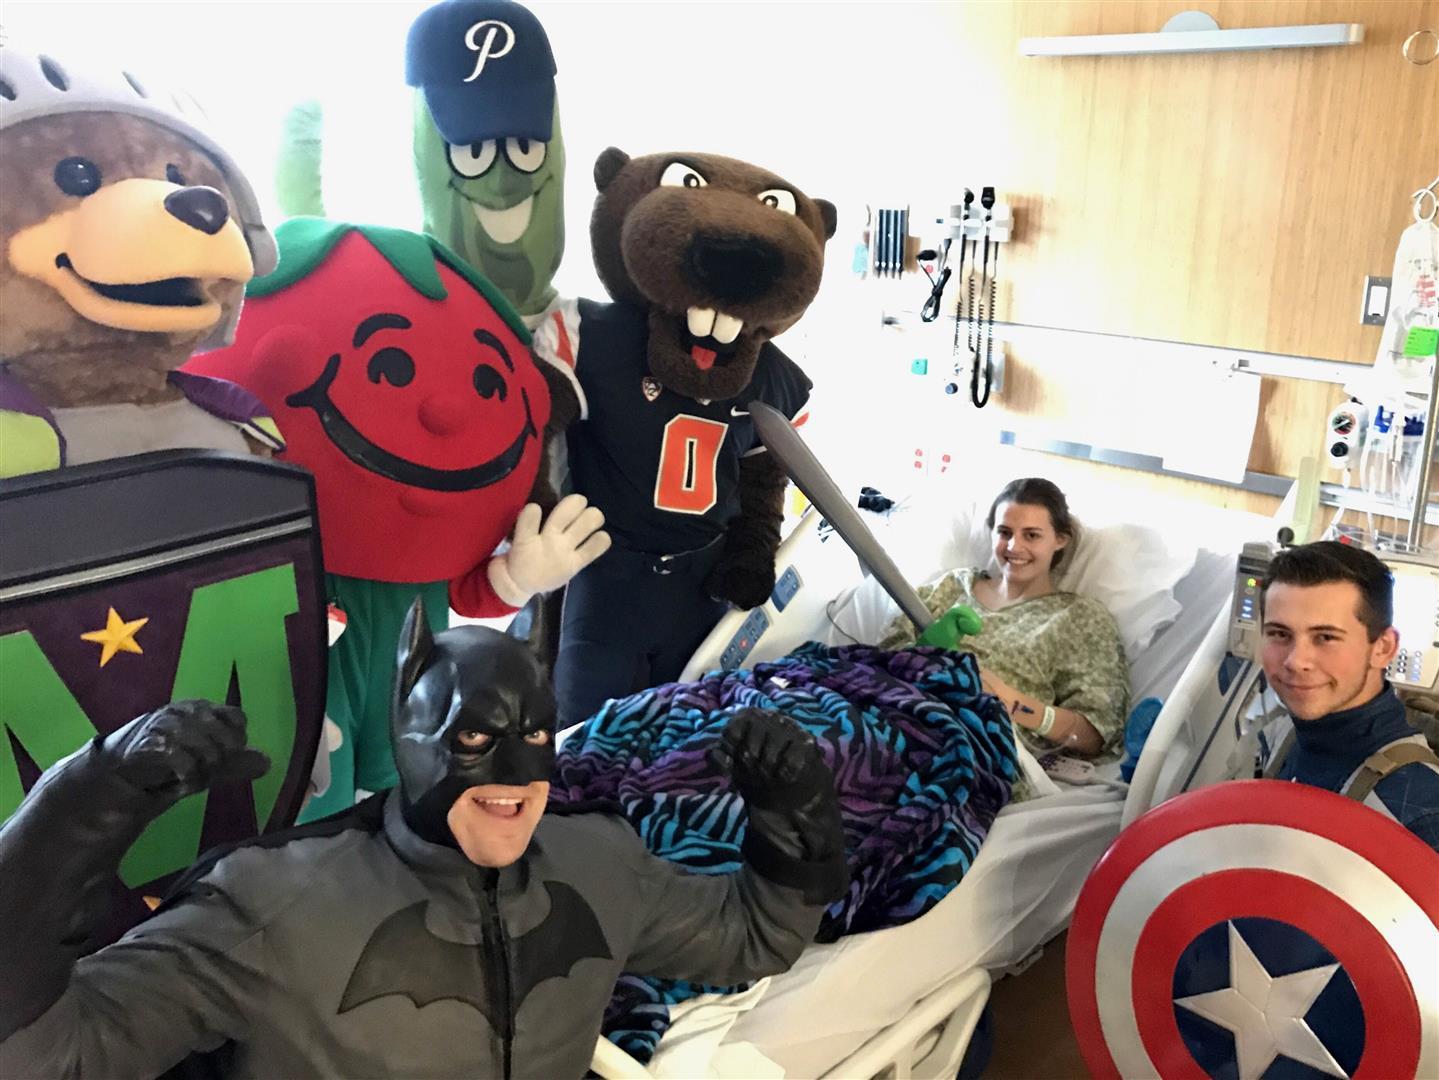 Randall-childrens-hospital-visit-5-large